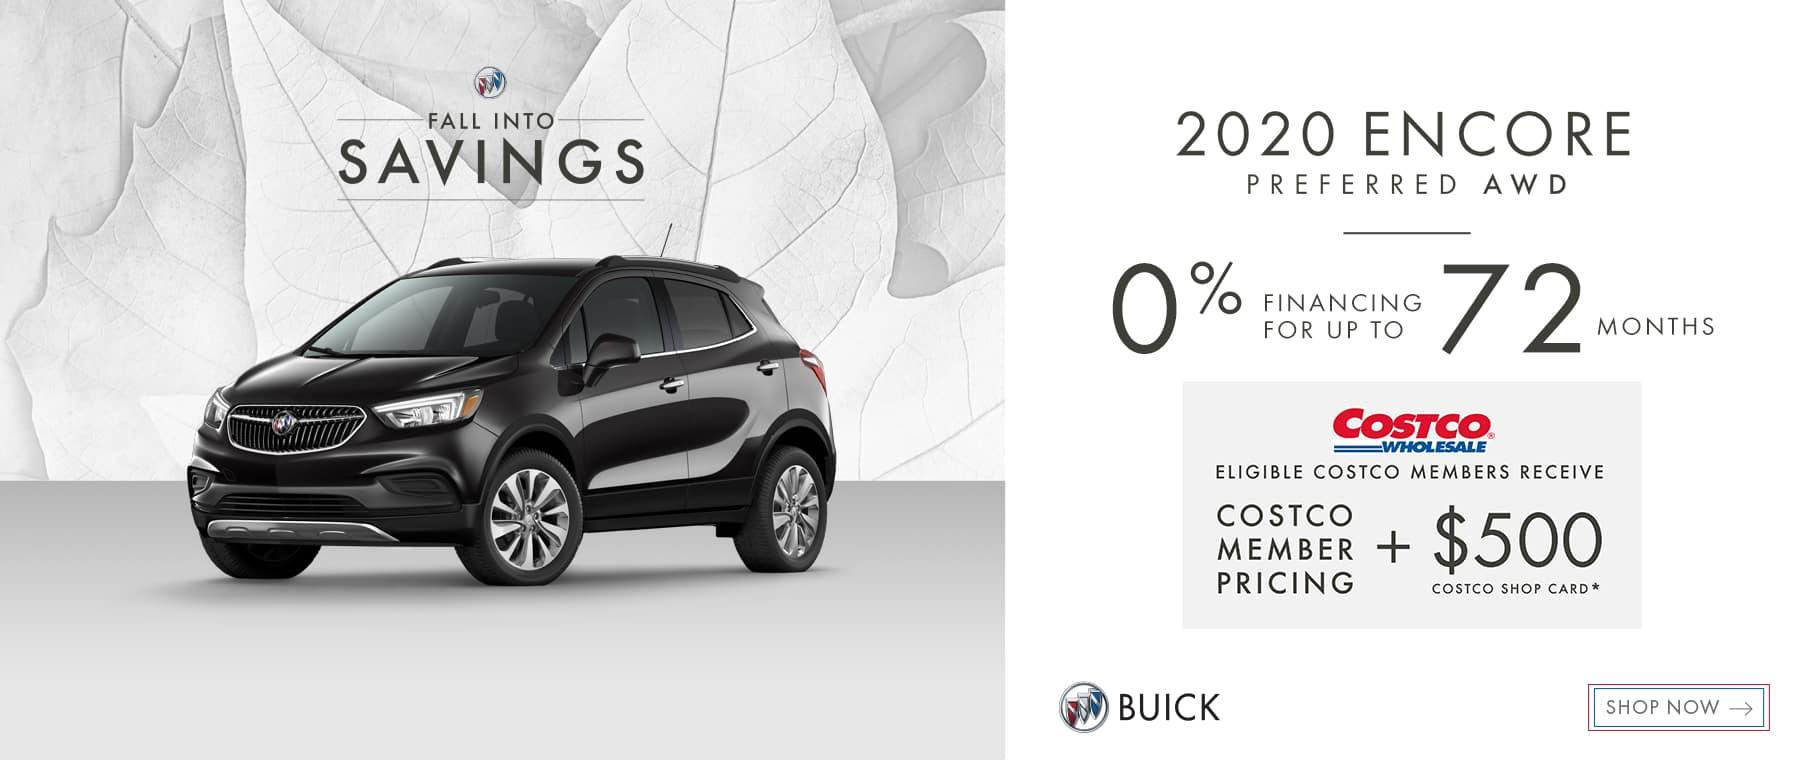 2020_WST_NOV_Buick_ENCORE_PREFERRED_AWD_T3_1800X760_v1